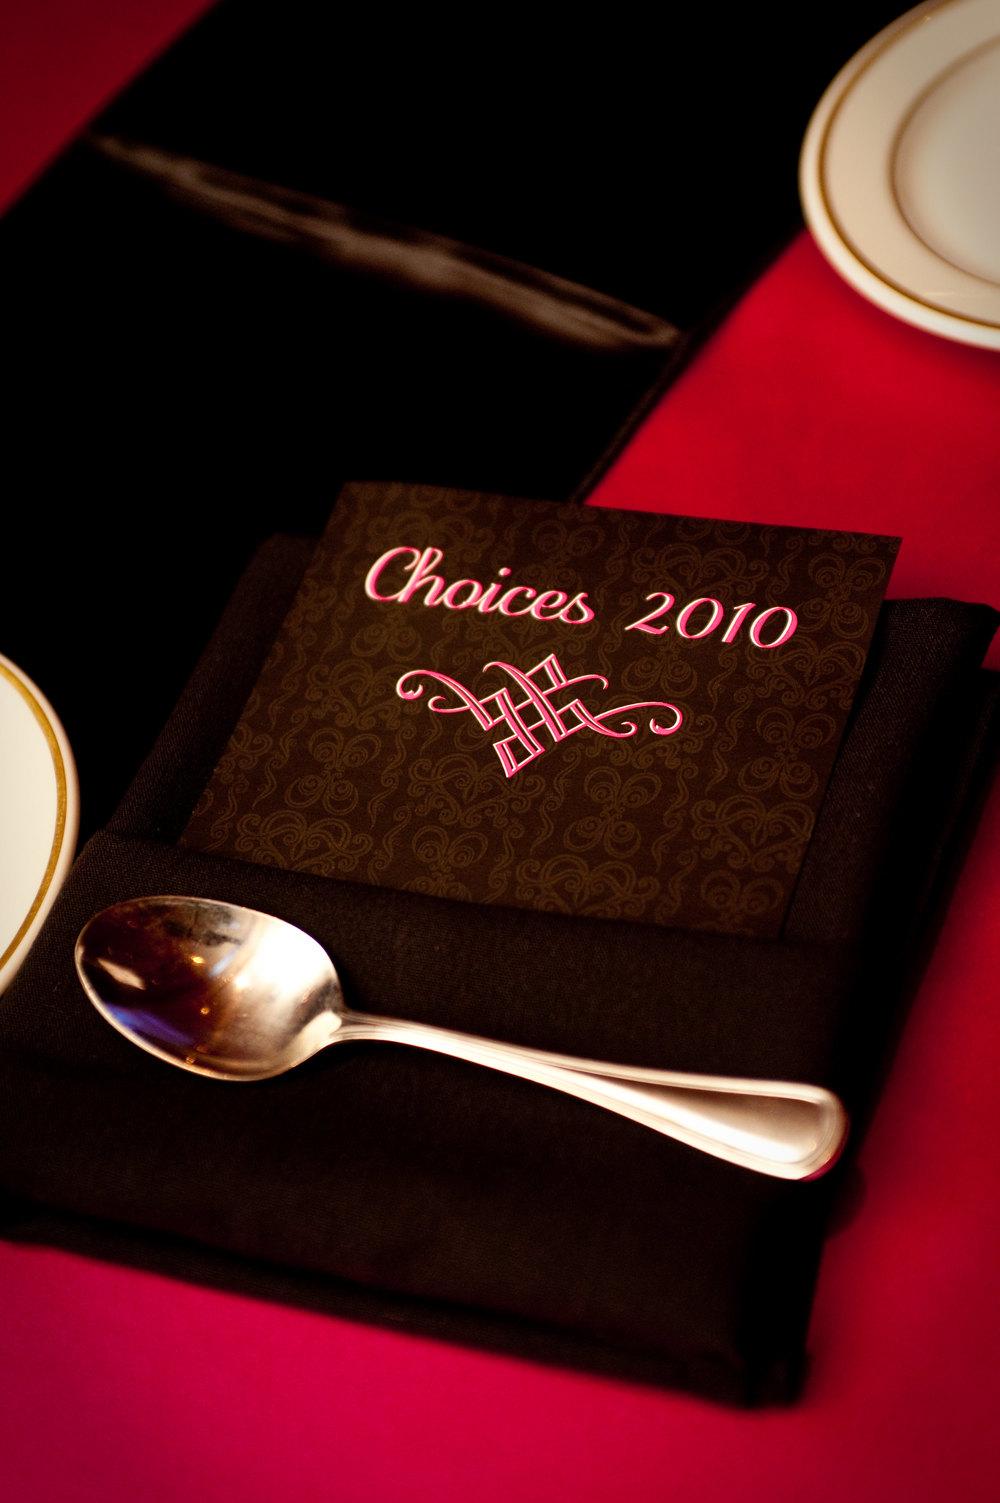 Choices-009.jpg